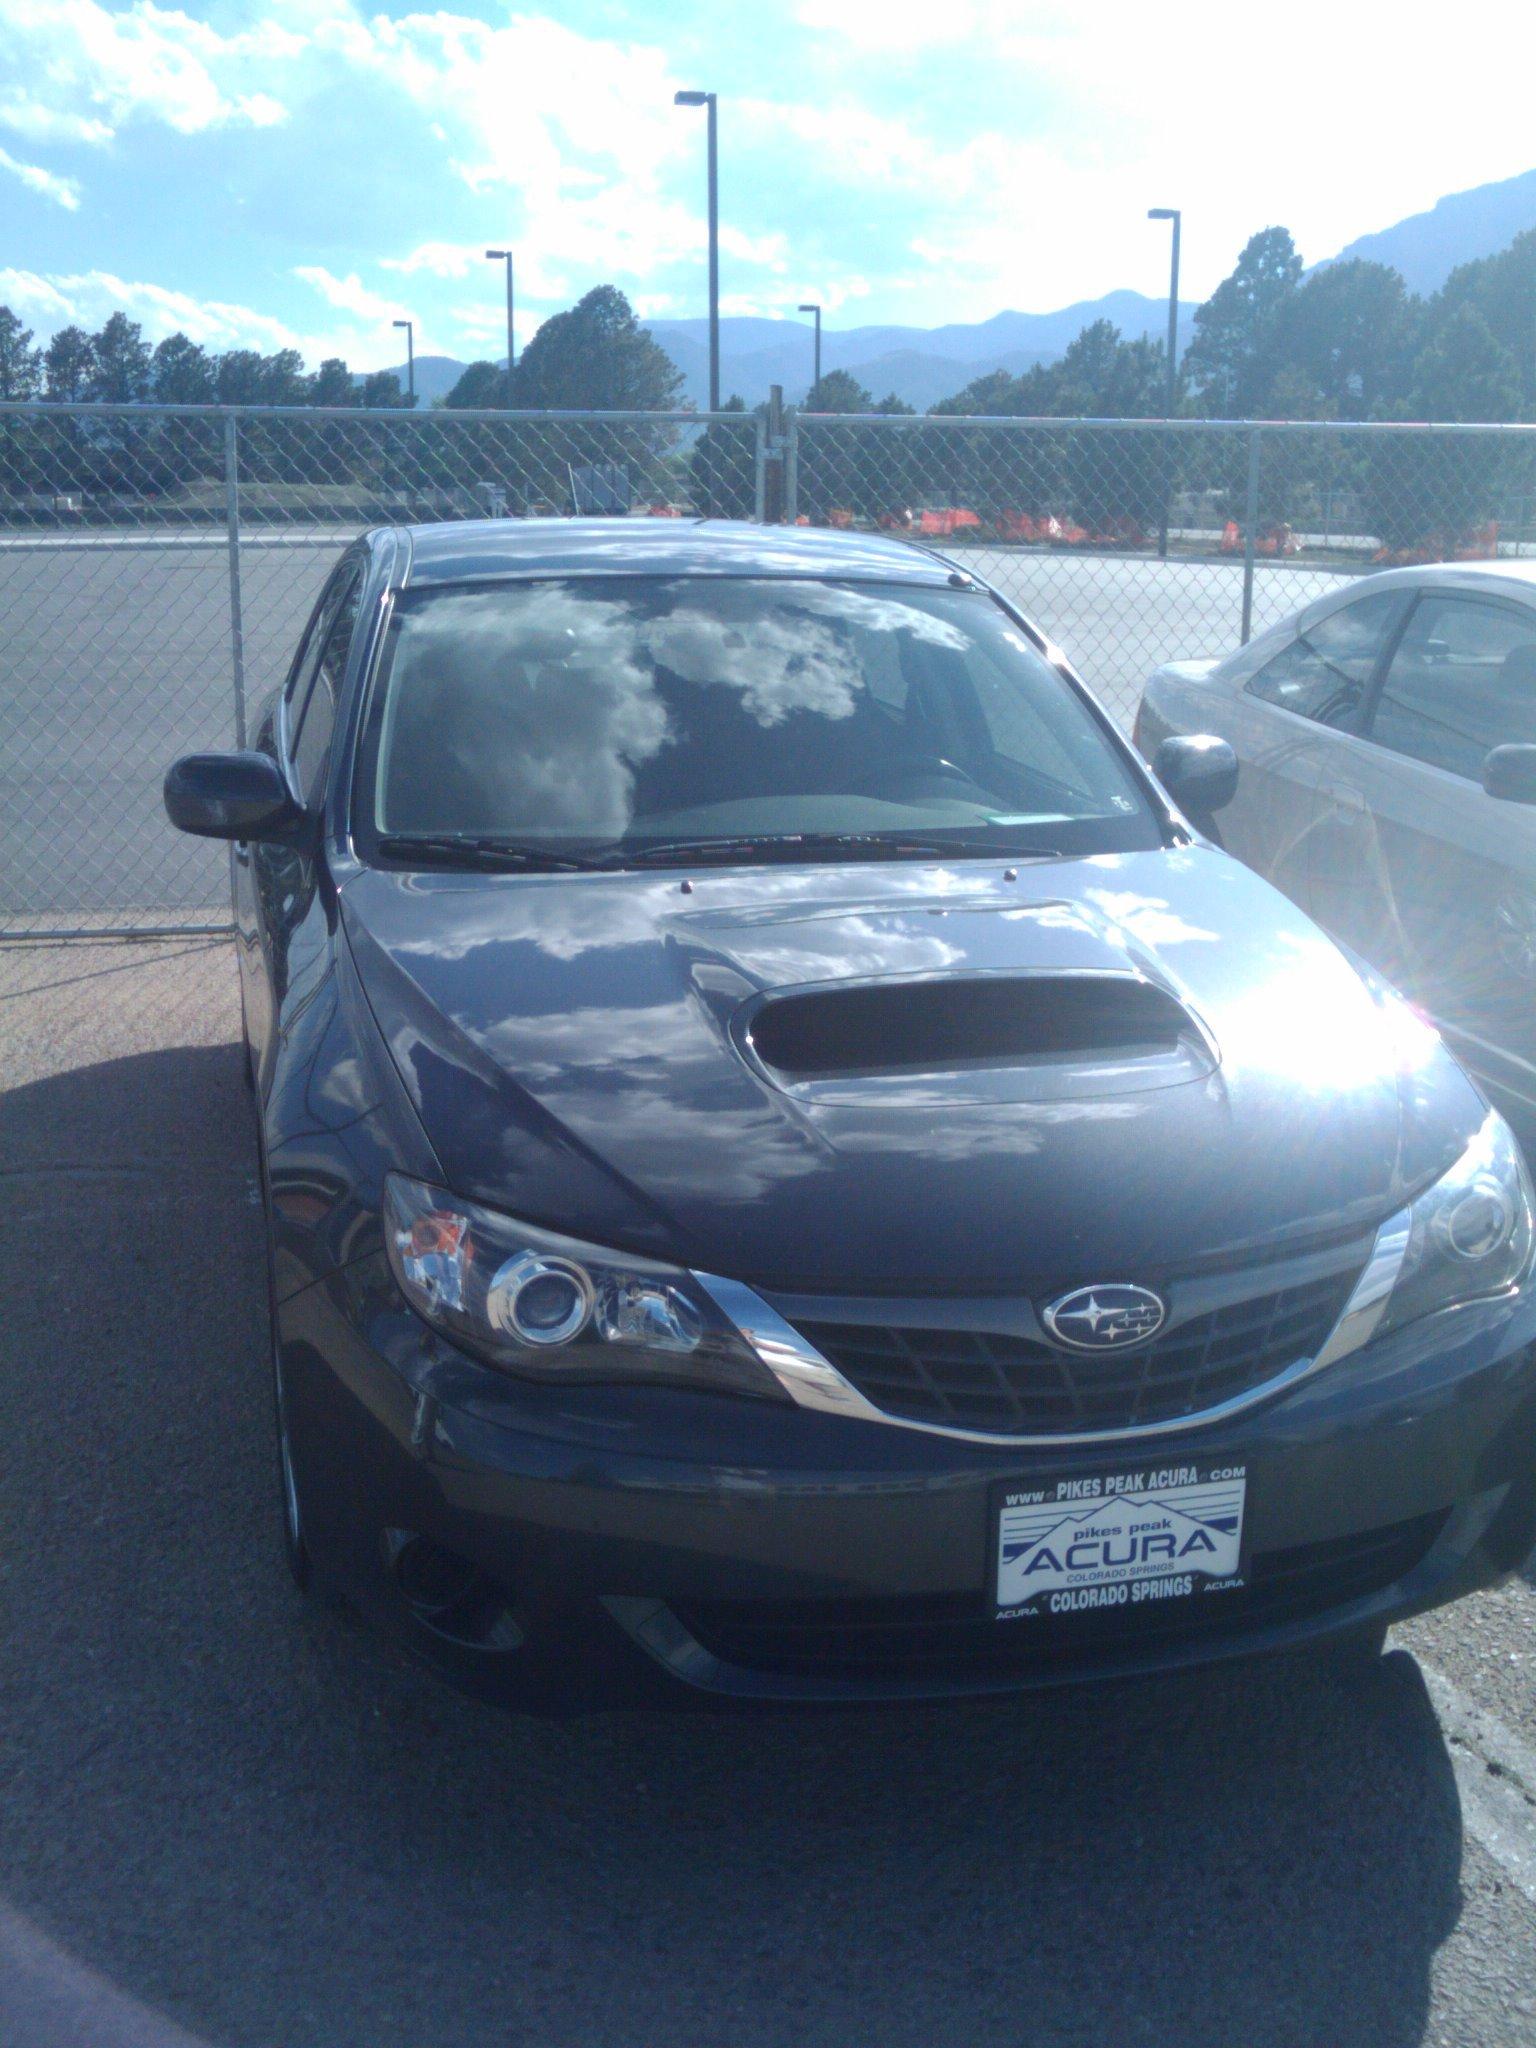 My little new car